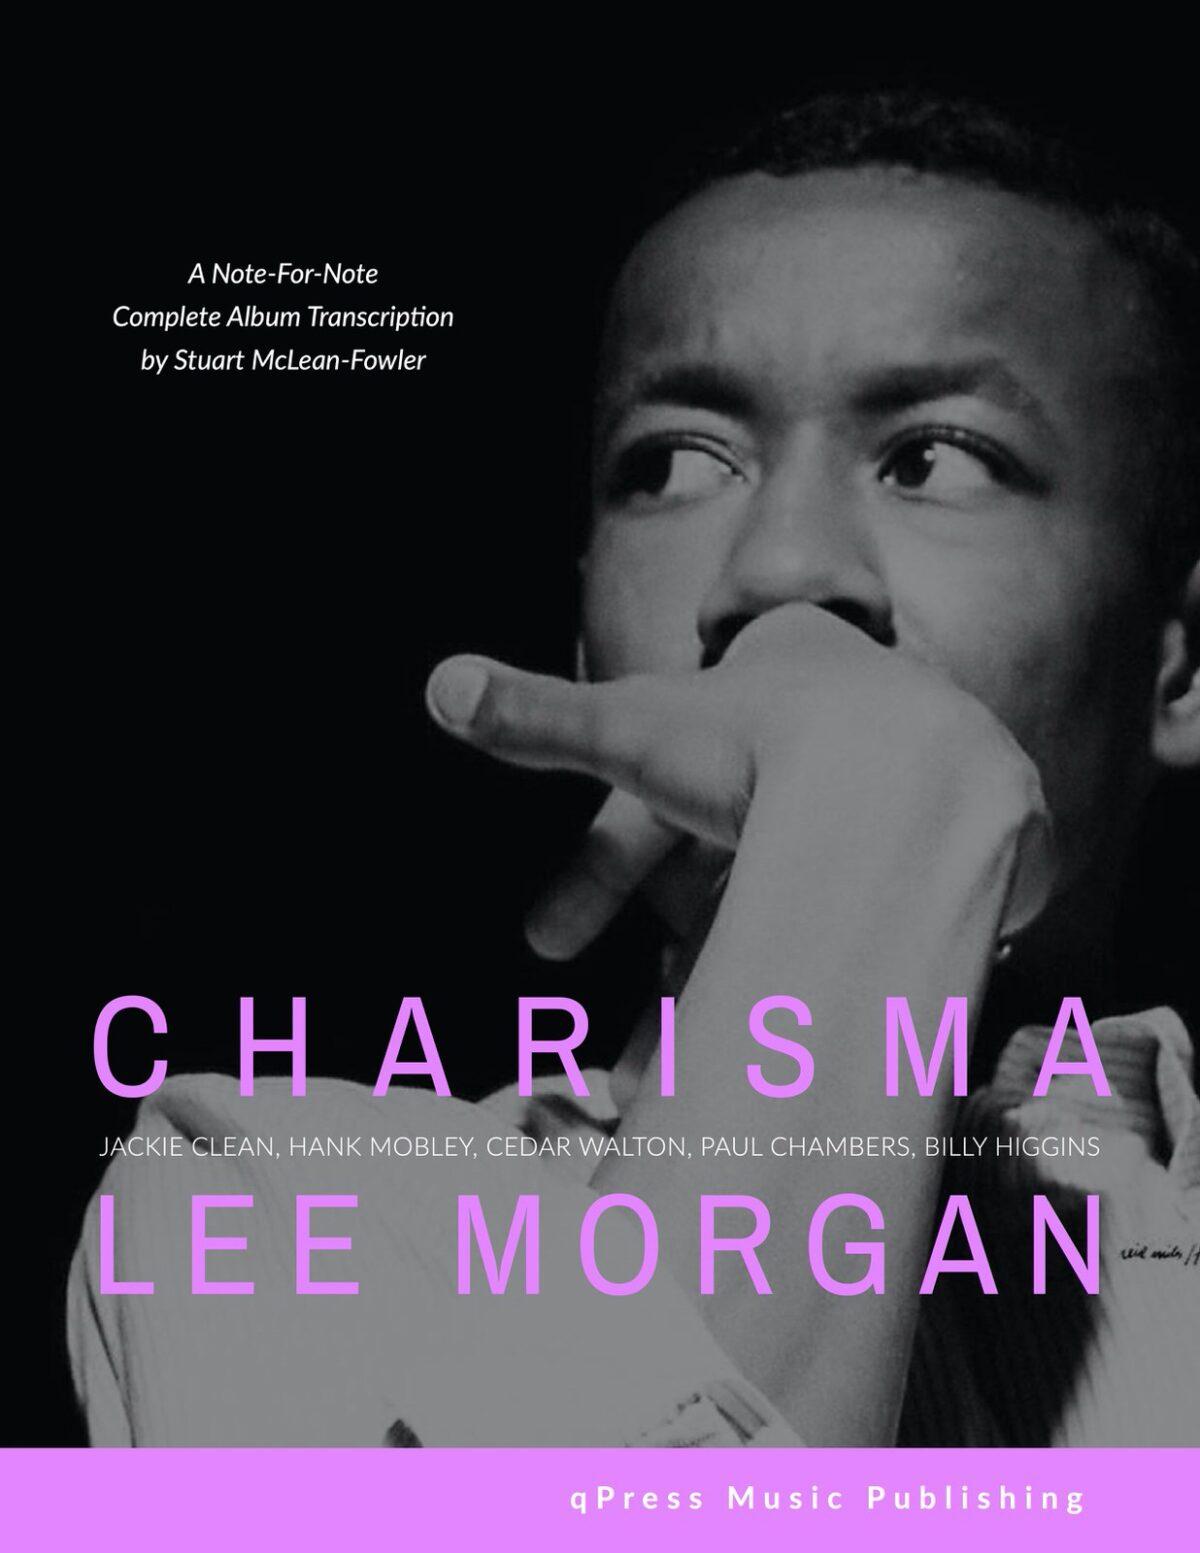 Morgan, Charisma Complete Album Transcription-p01